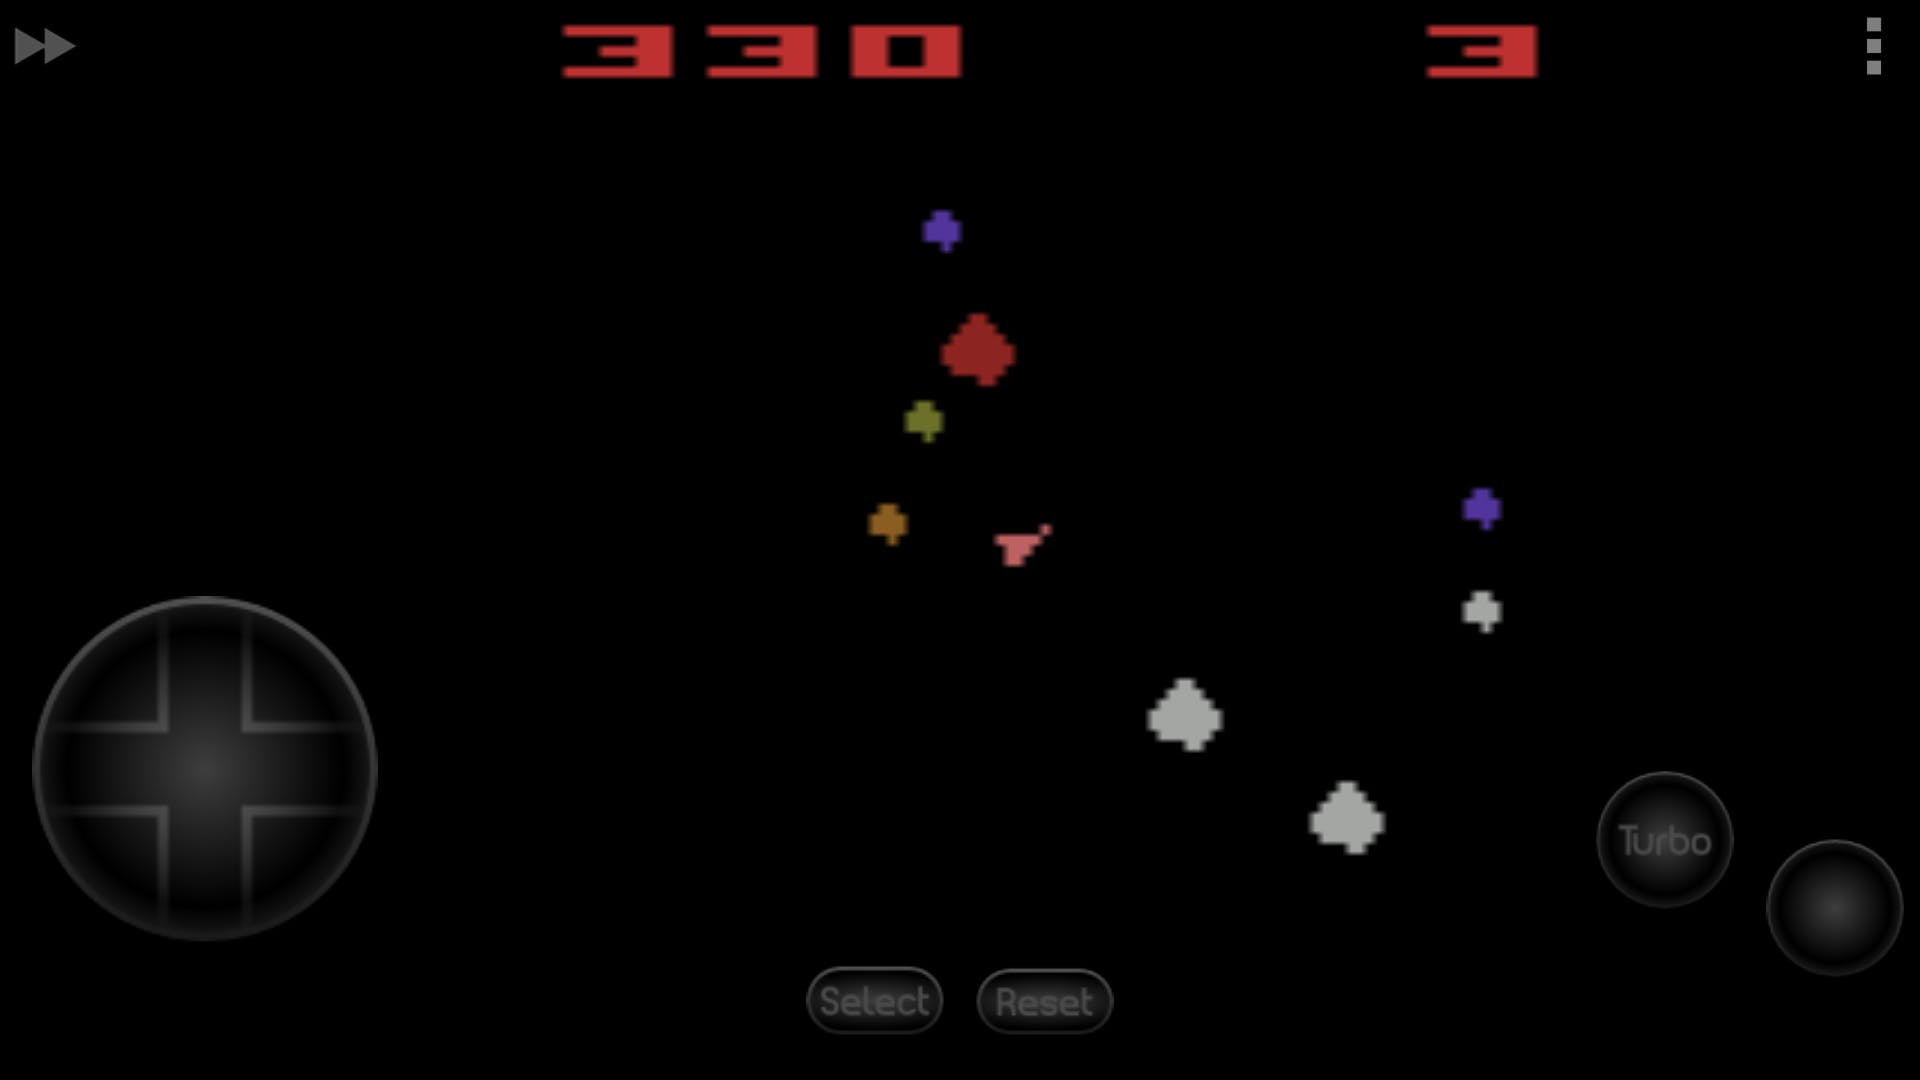 """Asteroids"" emulated on 2600.emu"